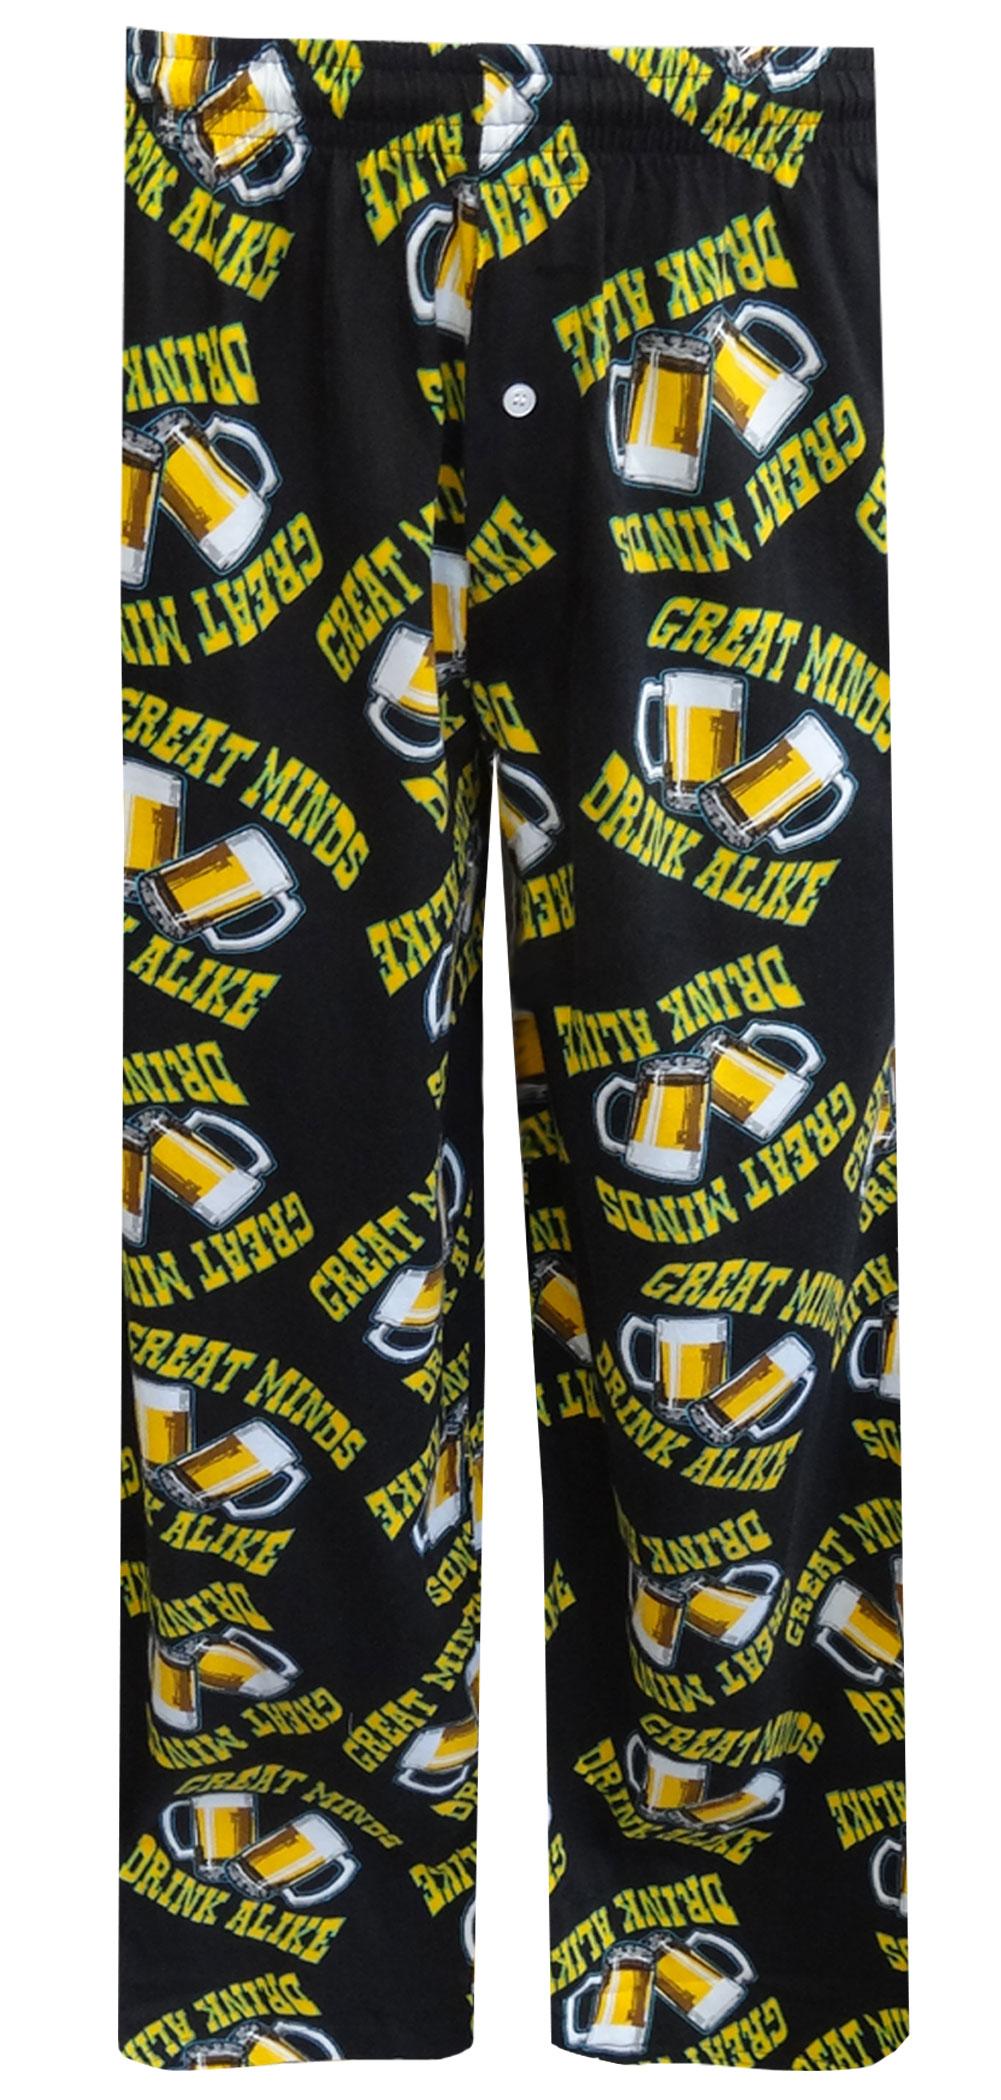 Great Minds Drink Alike Lounge Pants for men